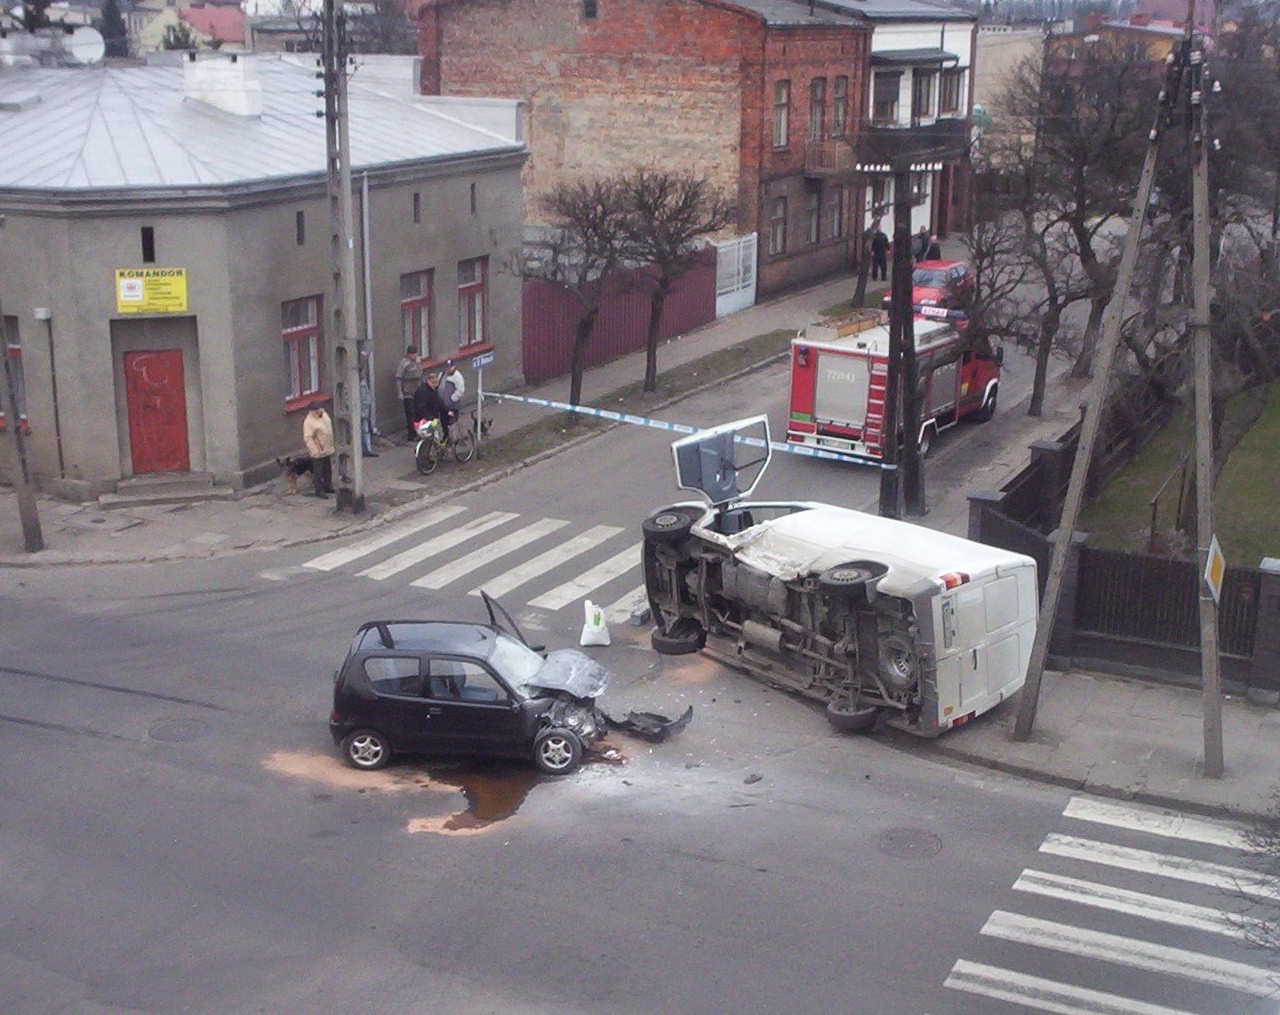 Accident en Pologne